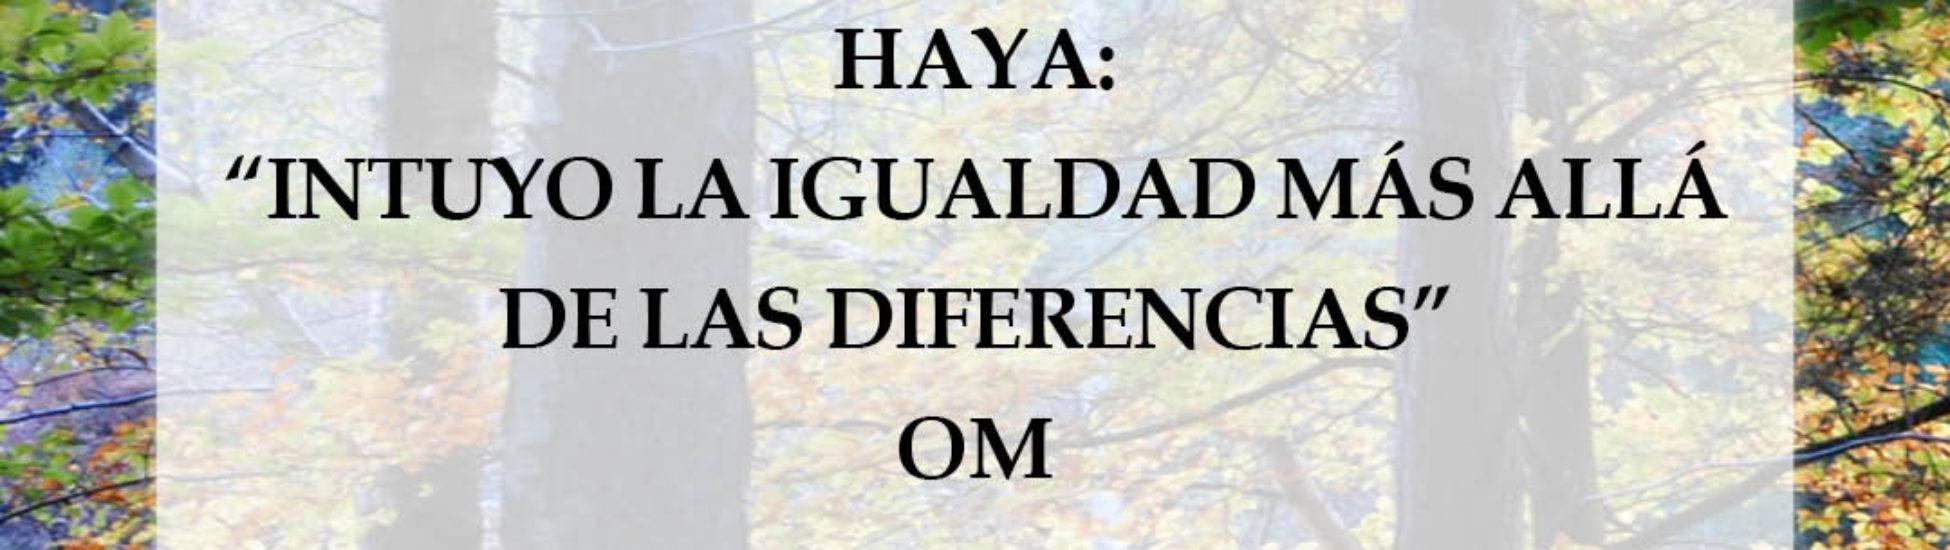 Haya om